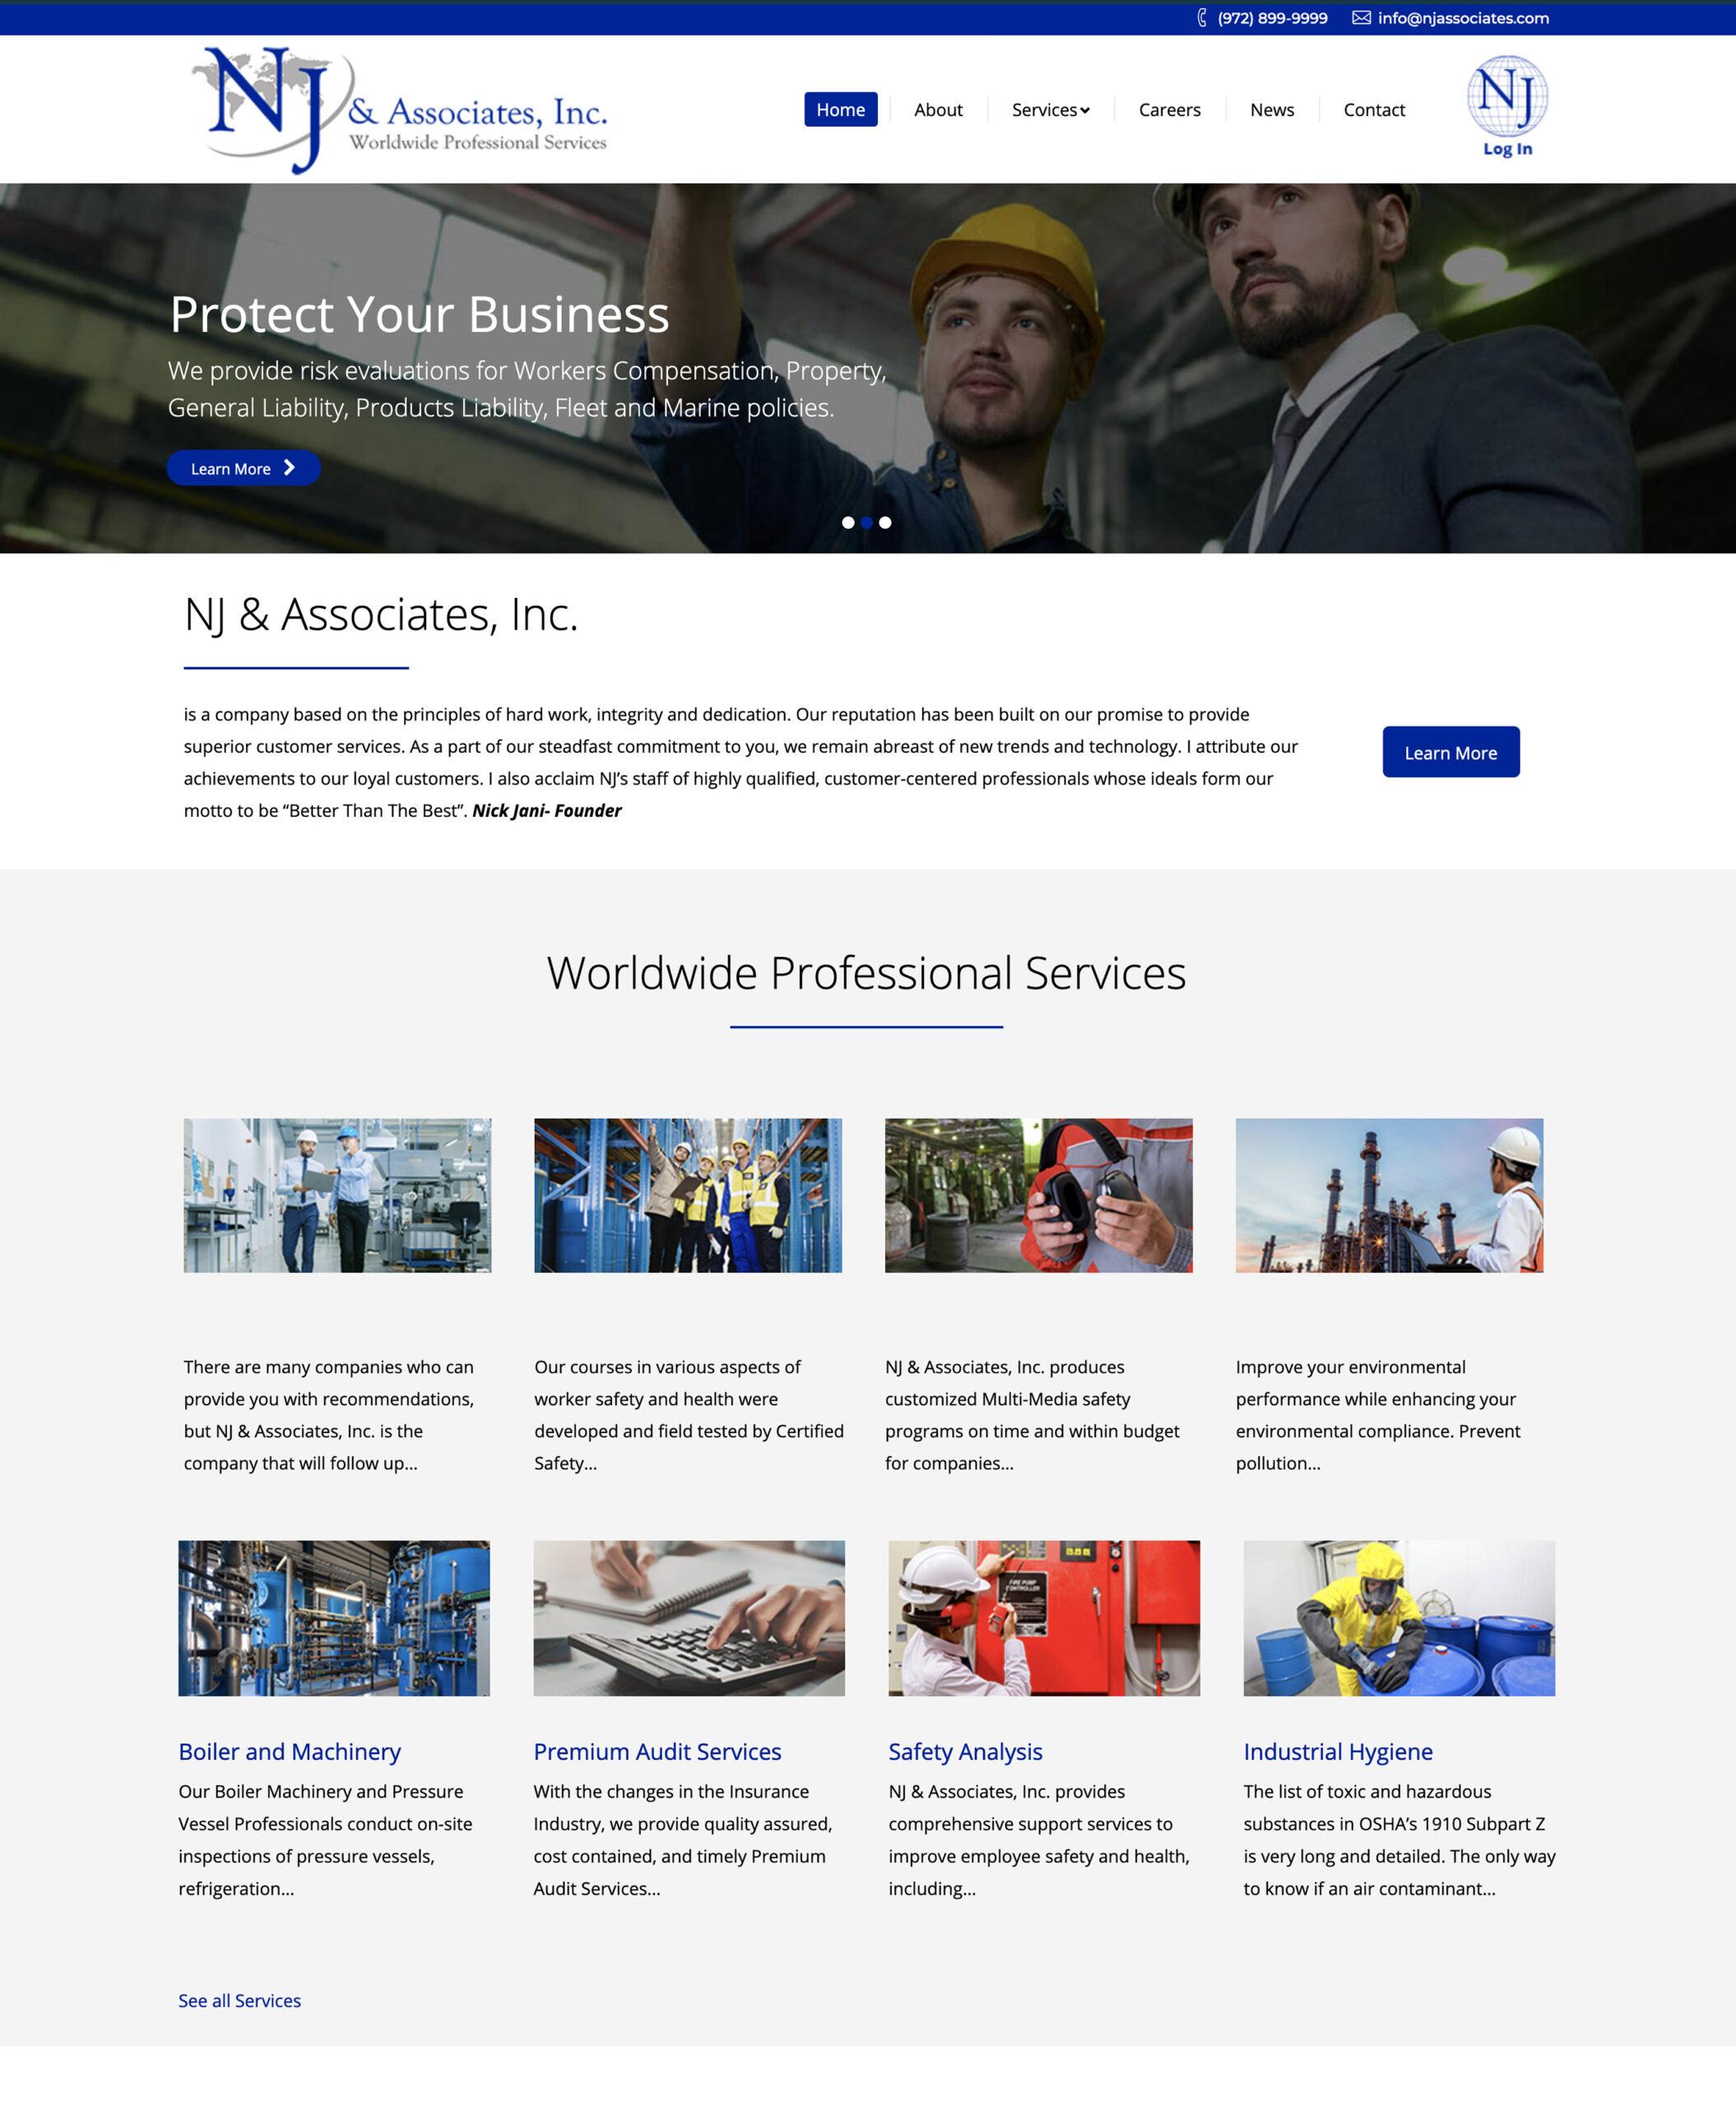 nj-Home Page